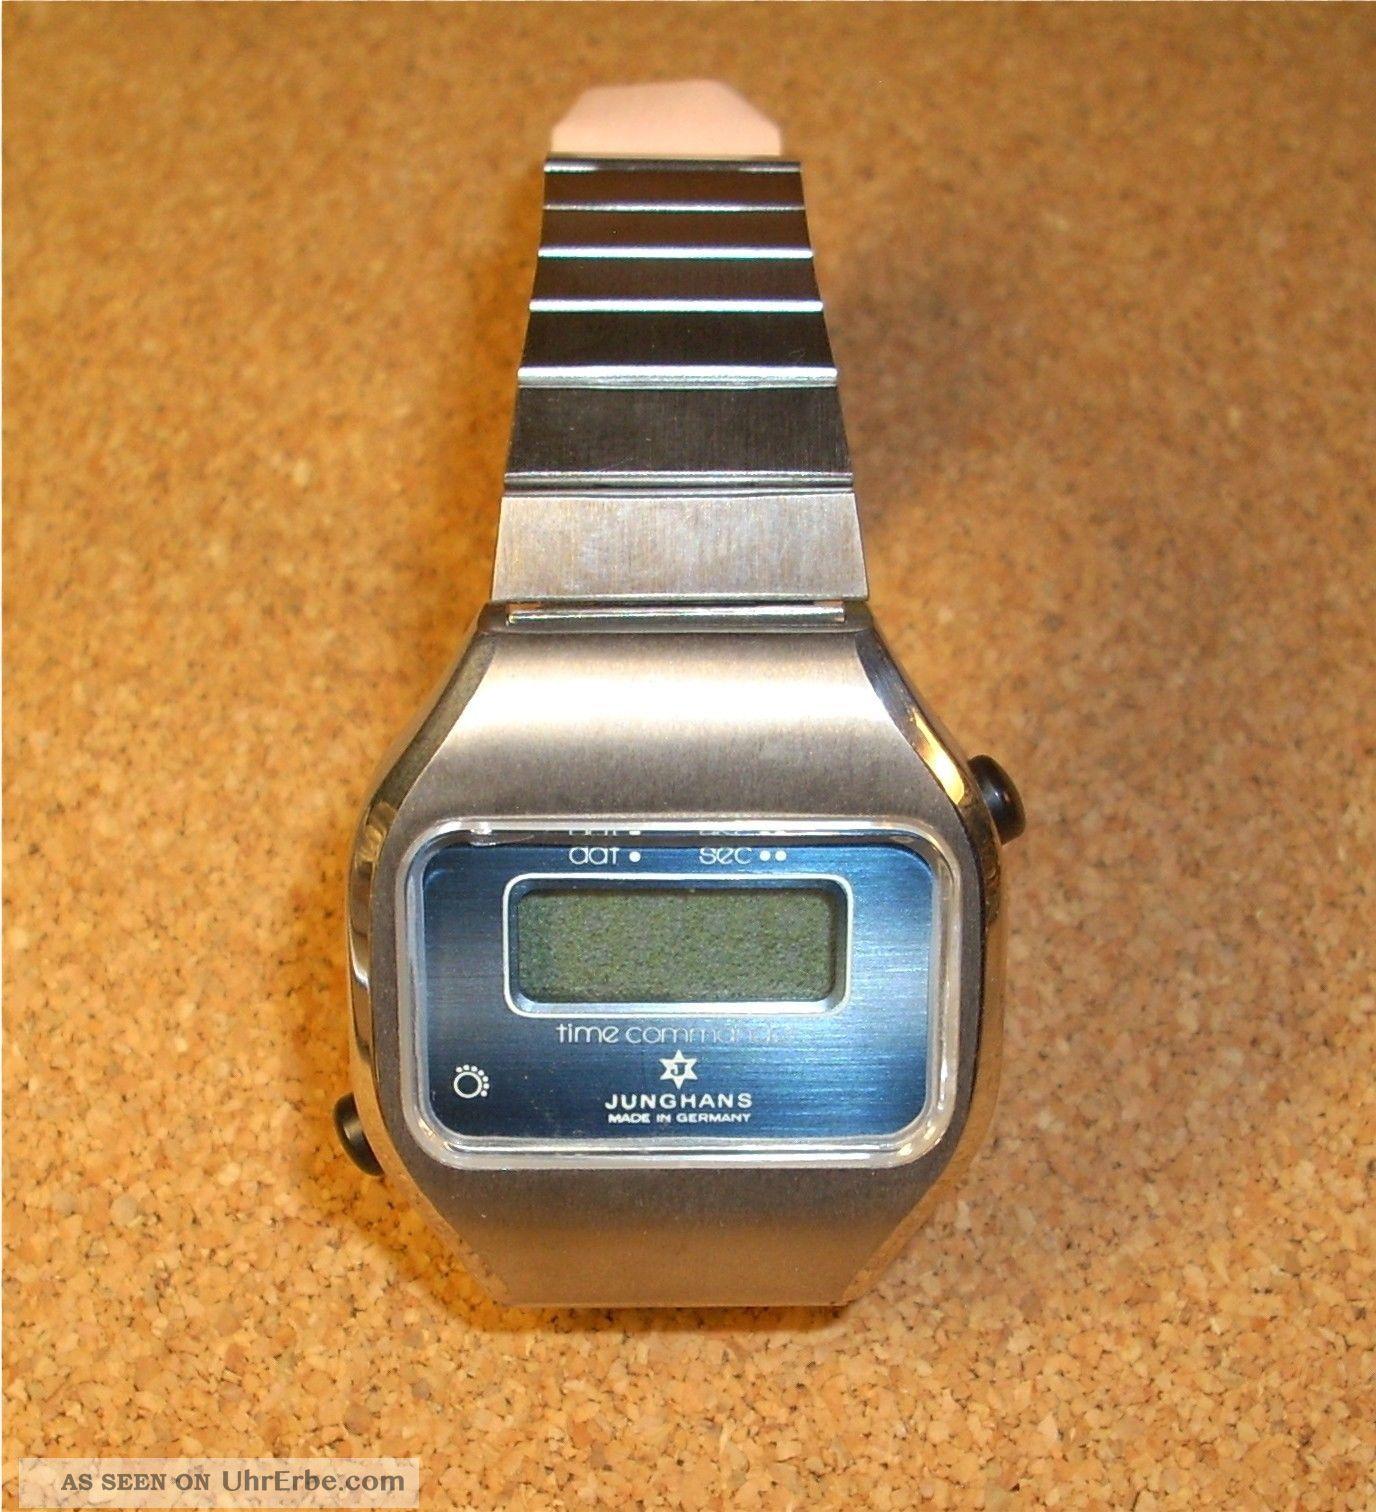 Junghans Herrenuhr Armbanduhr,  Time Commander,  Quartz,  Hau,  Nos Armbanduhren Bild